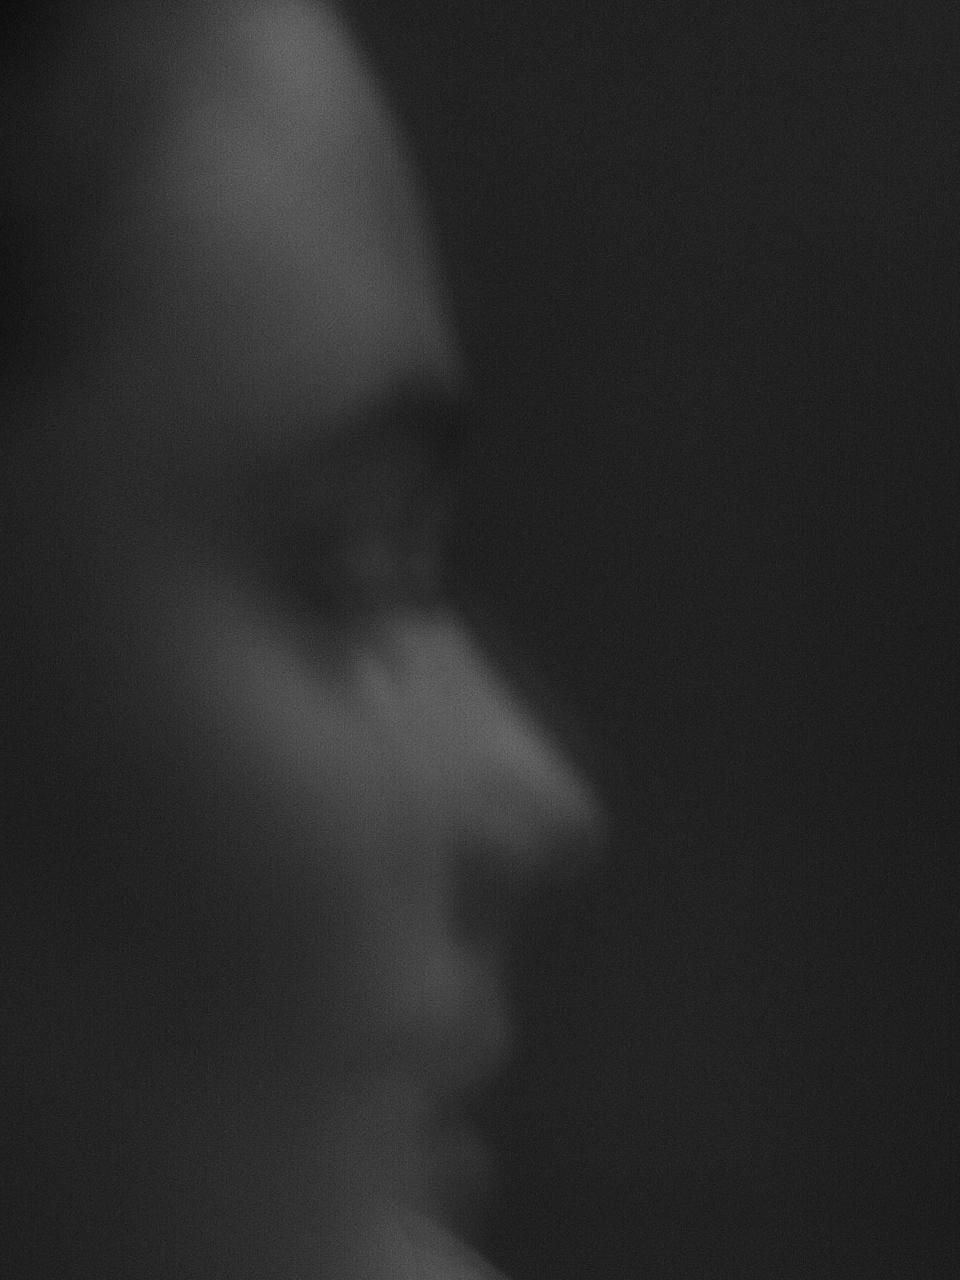 miami_boudoir_photographer_shannon_griffin-18copy.jpg